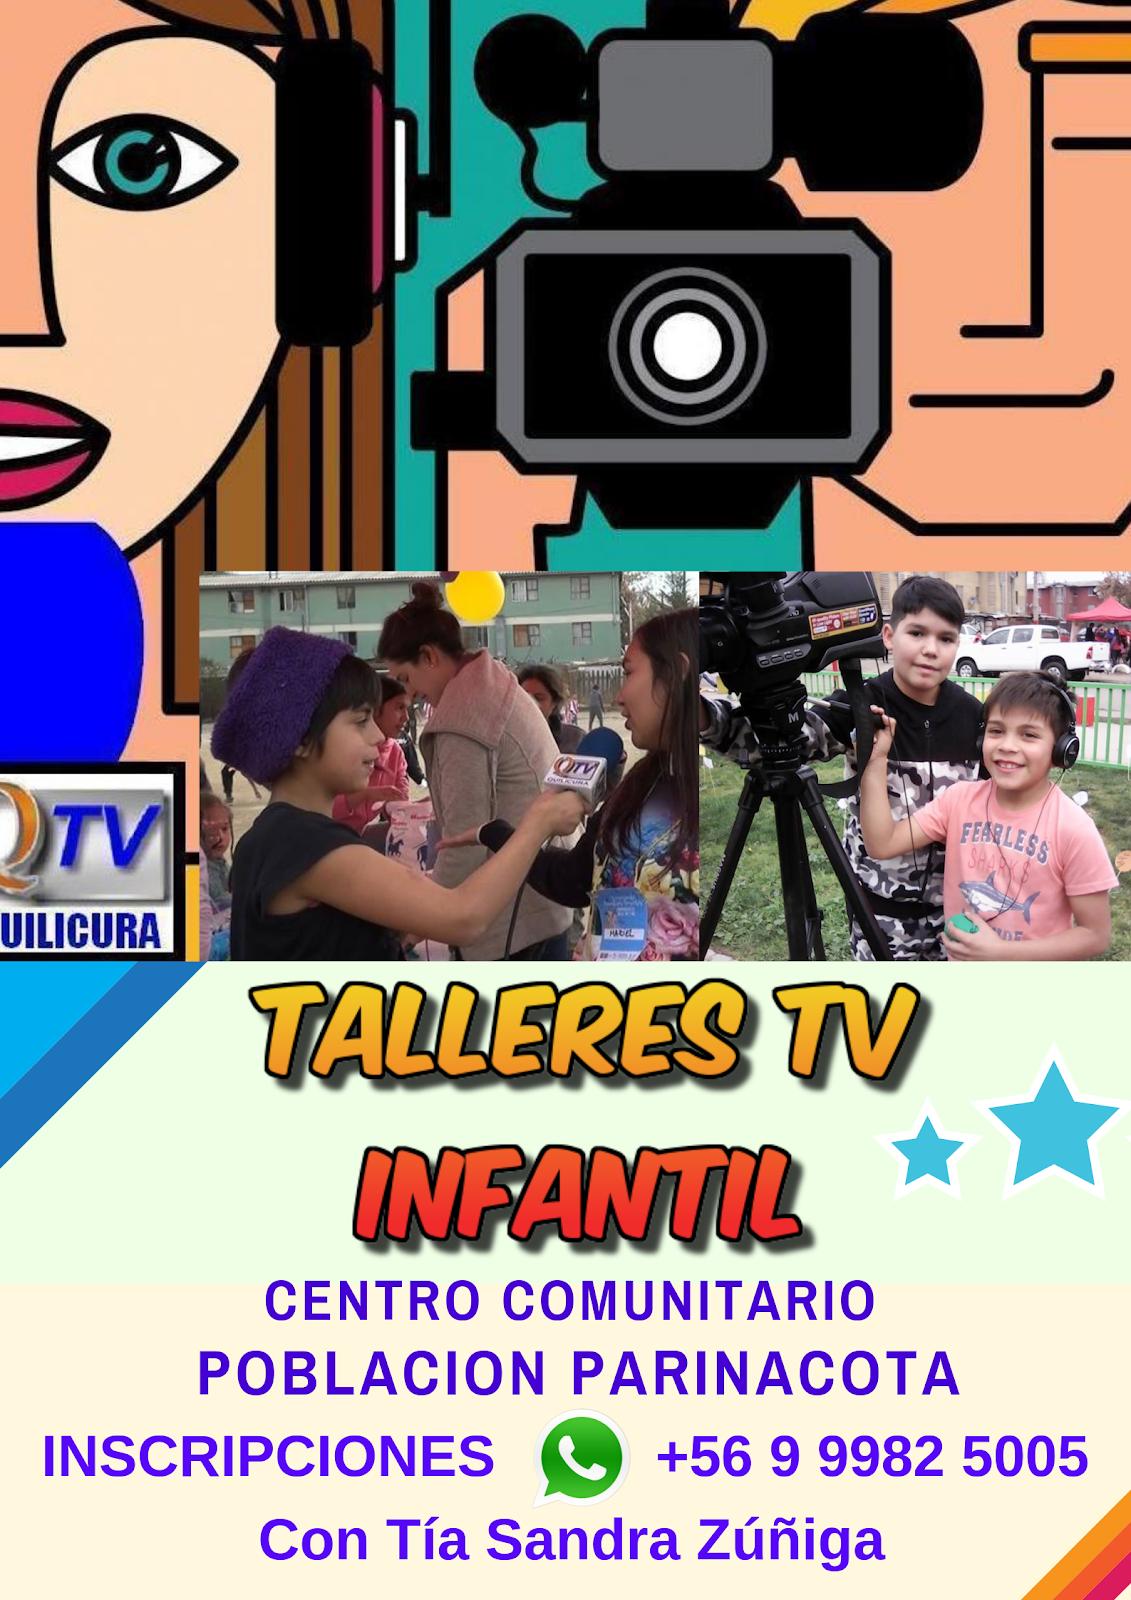 TALLERES de TV INFANTIL